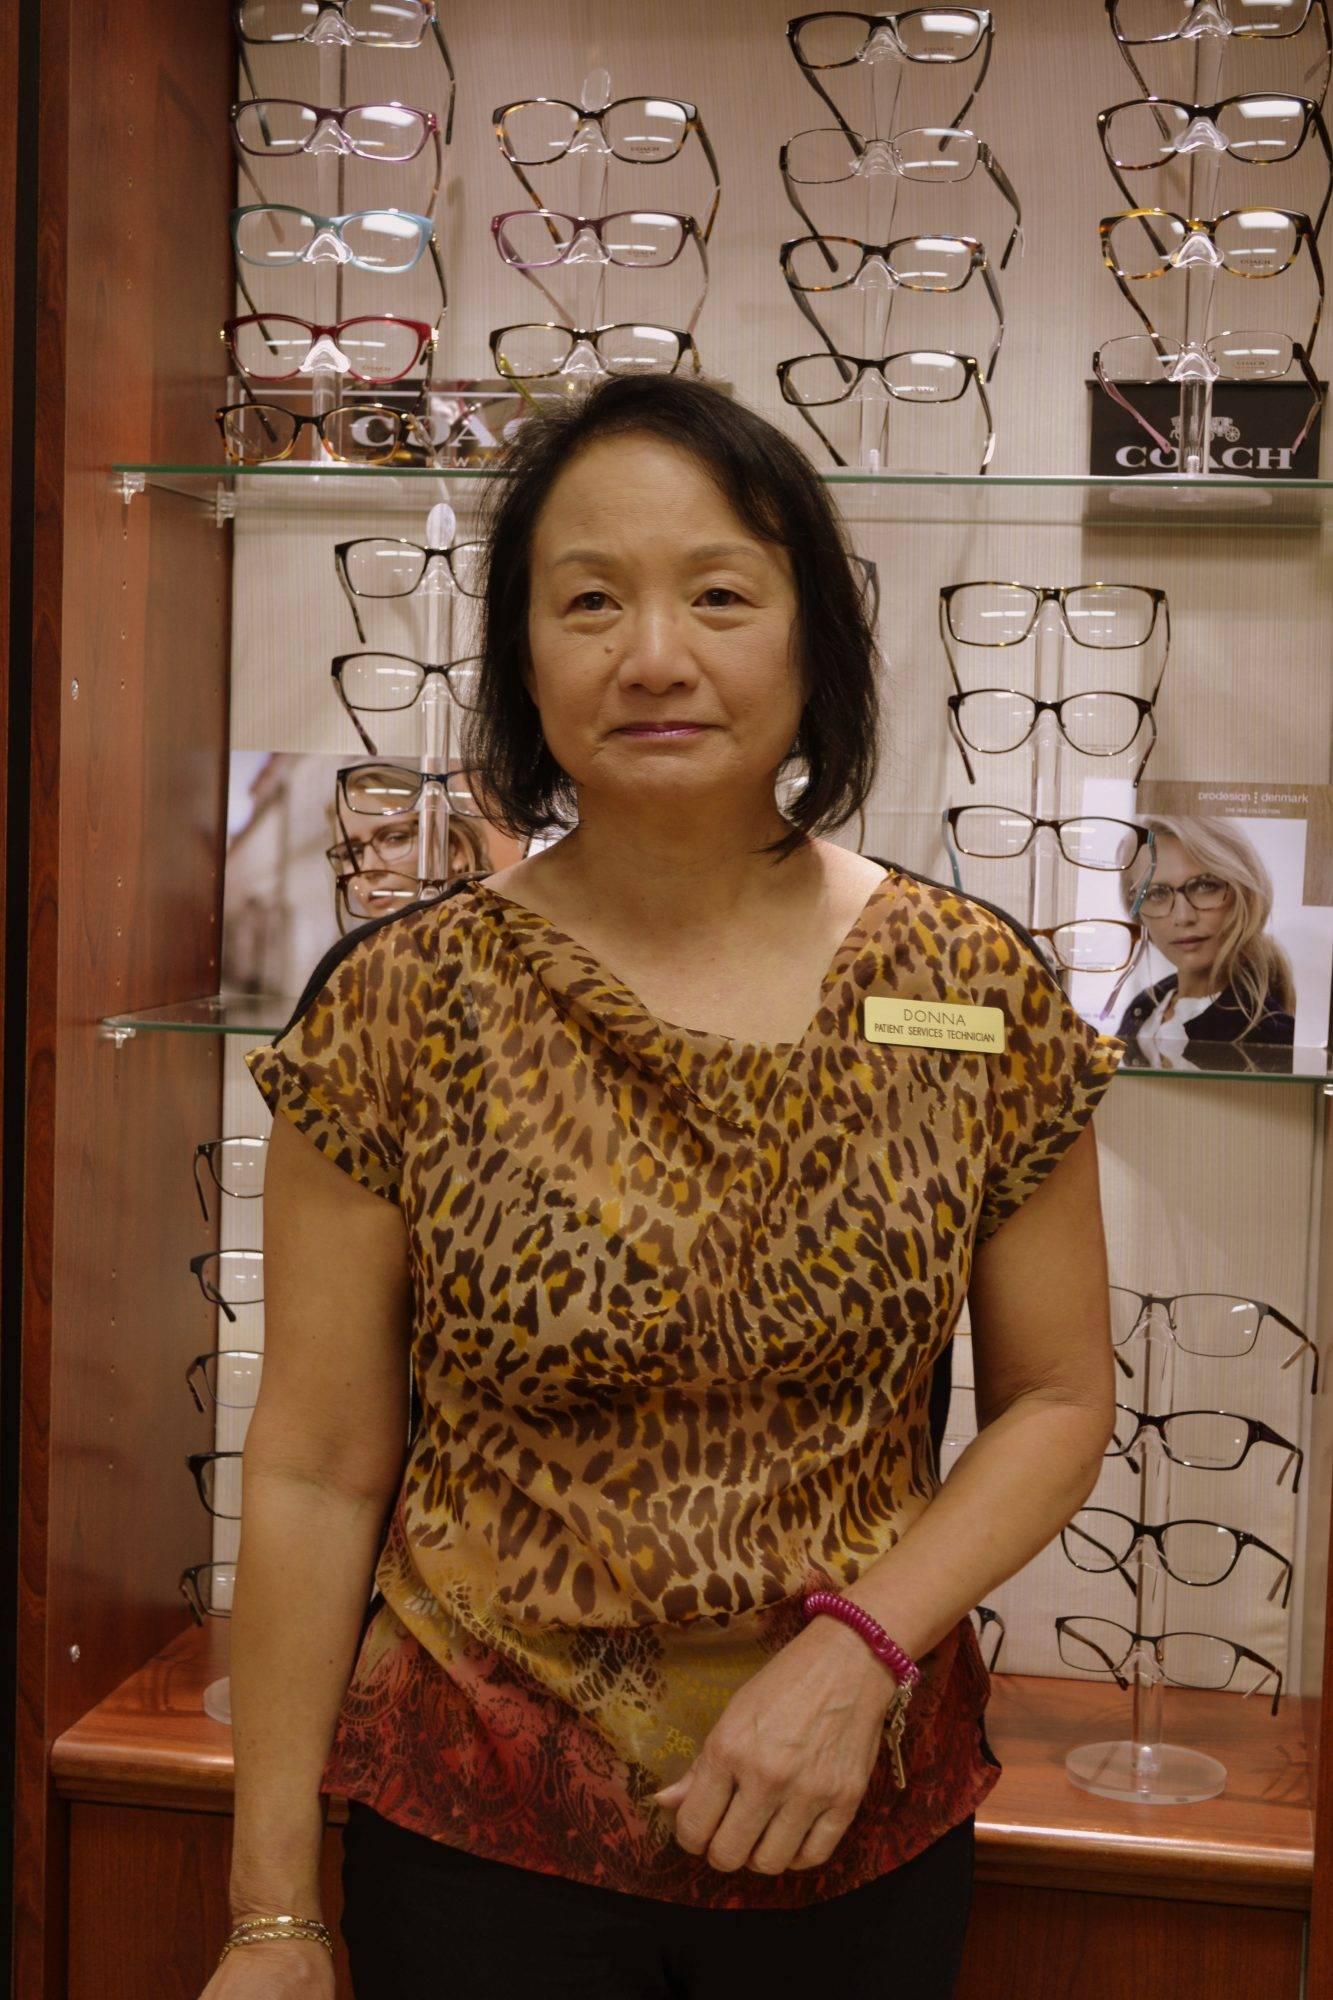 Donna_optical-e1519864980644